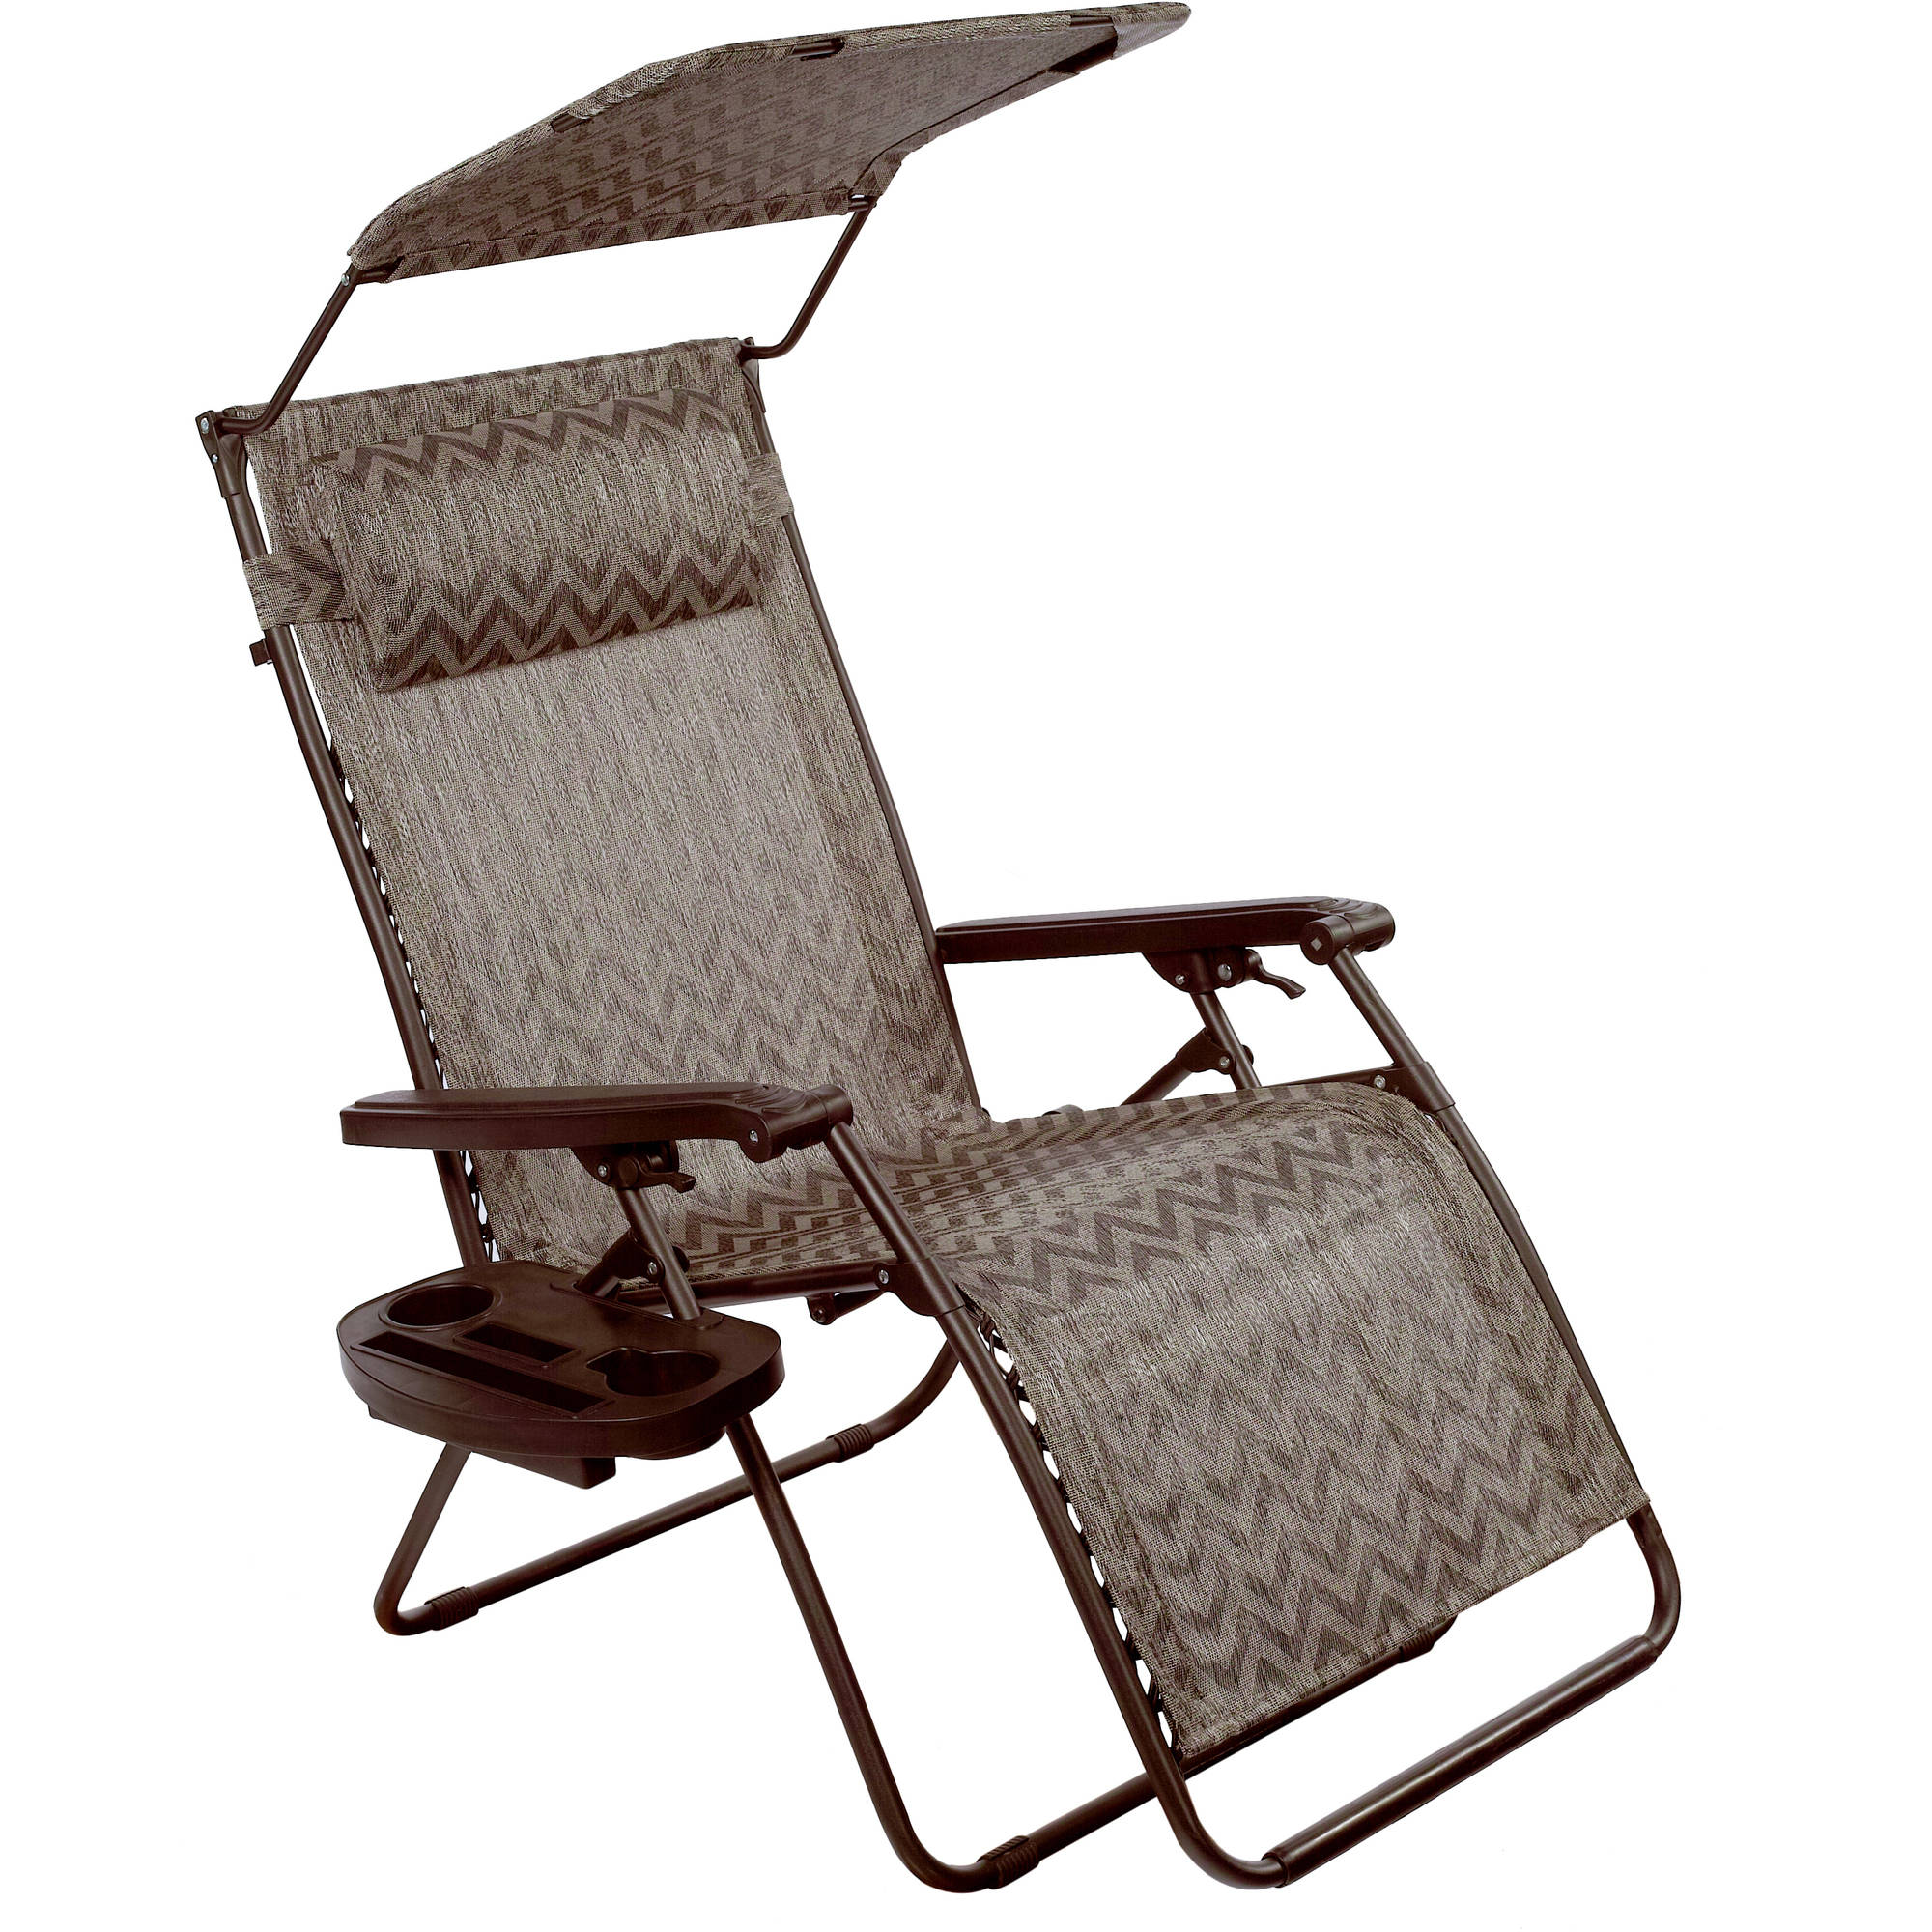 Bliss Zero Gravity Chair Bliss Hammocks Deluxe XL Gravity Free Recliner Zero ...